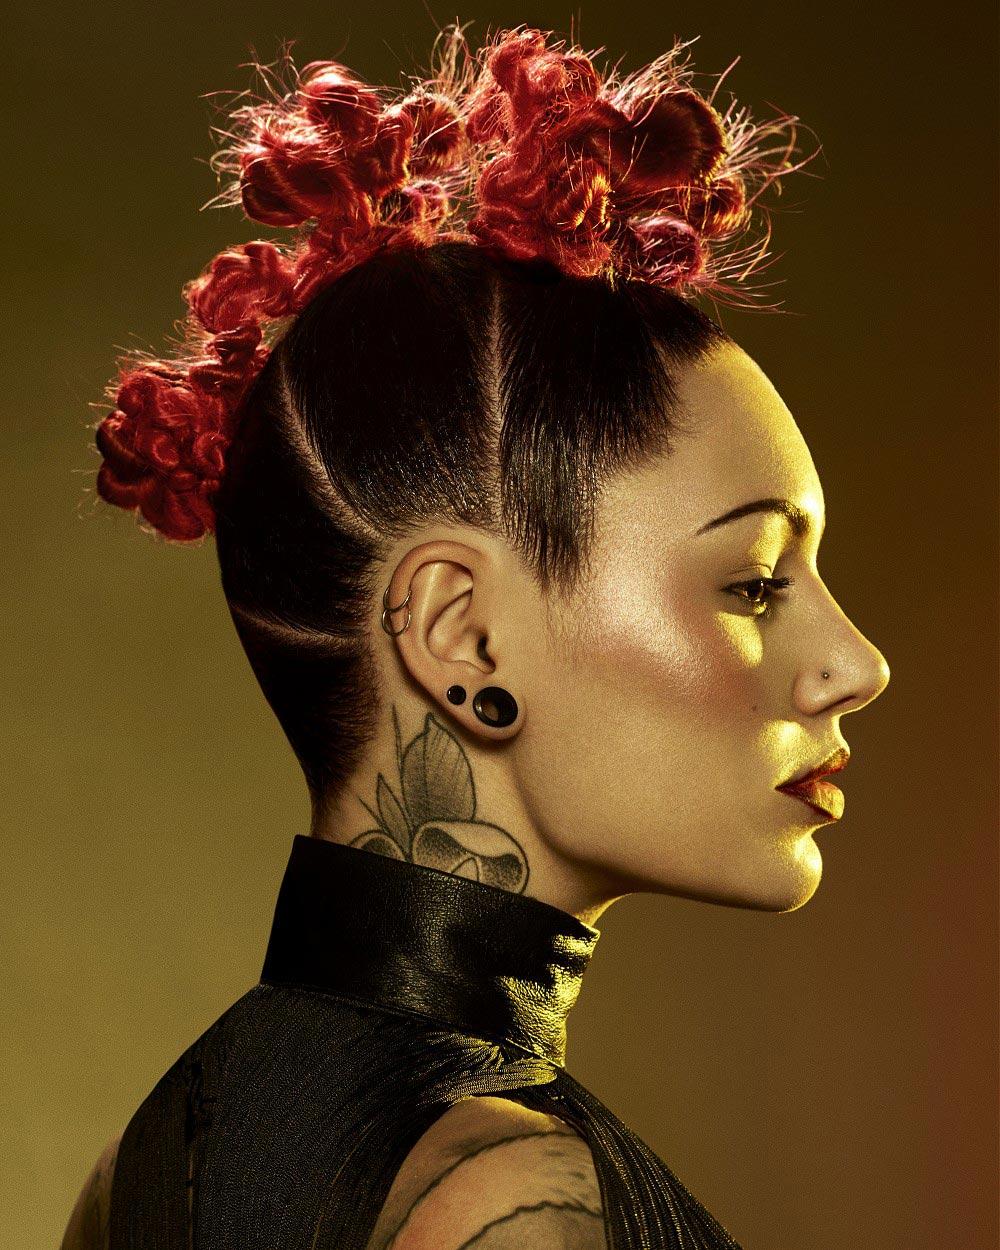 Drdol á la pletený mohawk z kolekce Halo Hair (vlasy: Joseph Ferraro @ Halo Hair & Beauty / Harrogate, barvy: Natalie Garcia Sanz, make-up: Emily Jane Williams, styling: Siouxsie, foto: Richard Miles.)